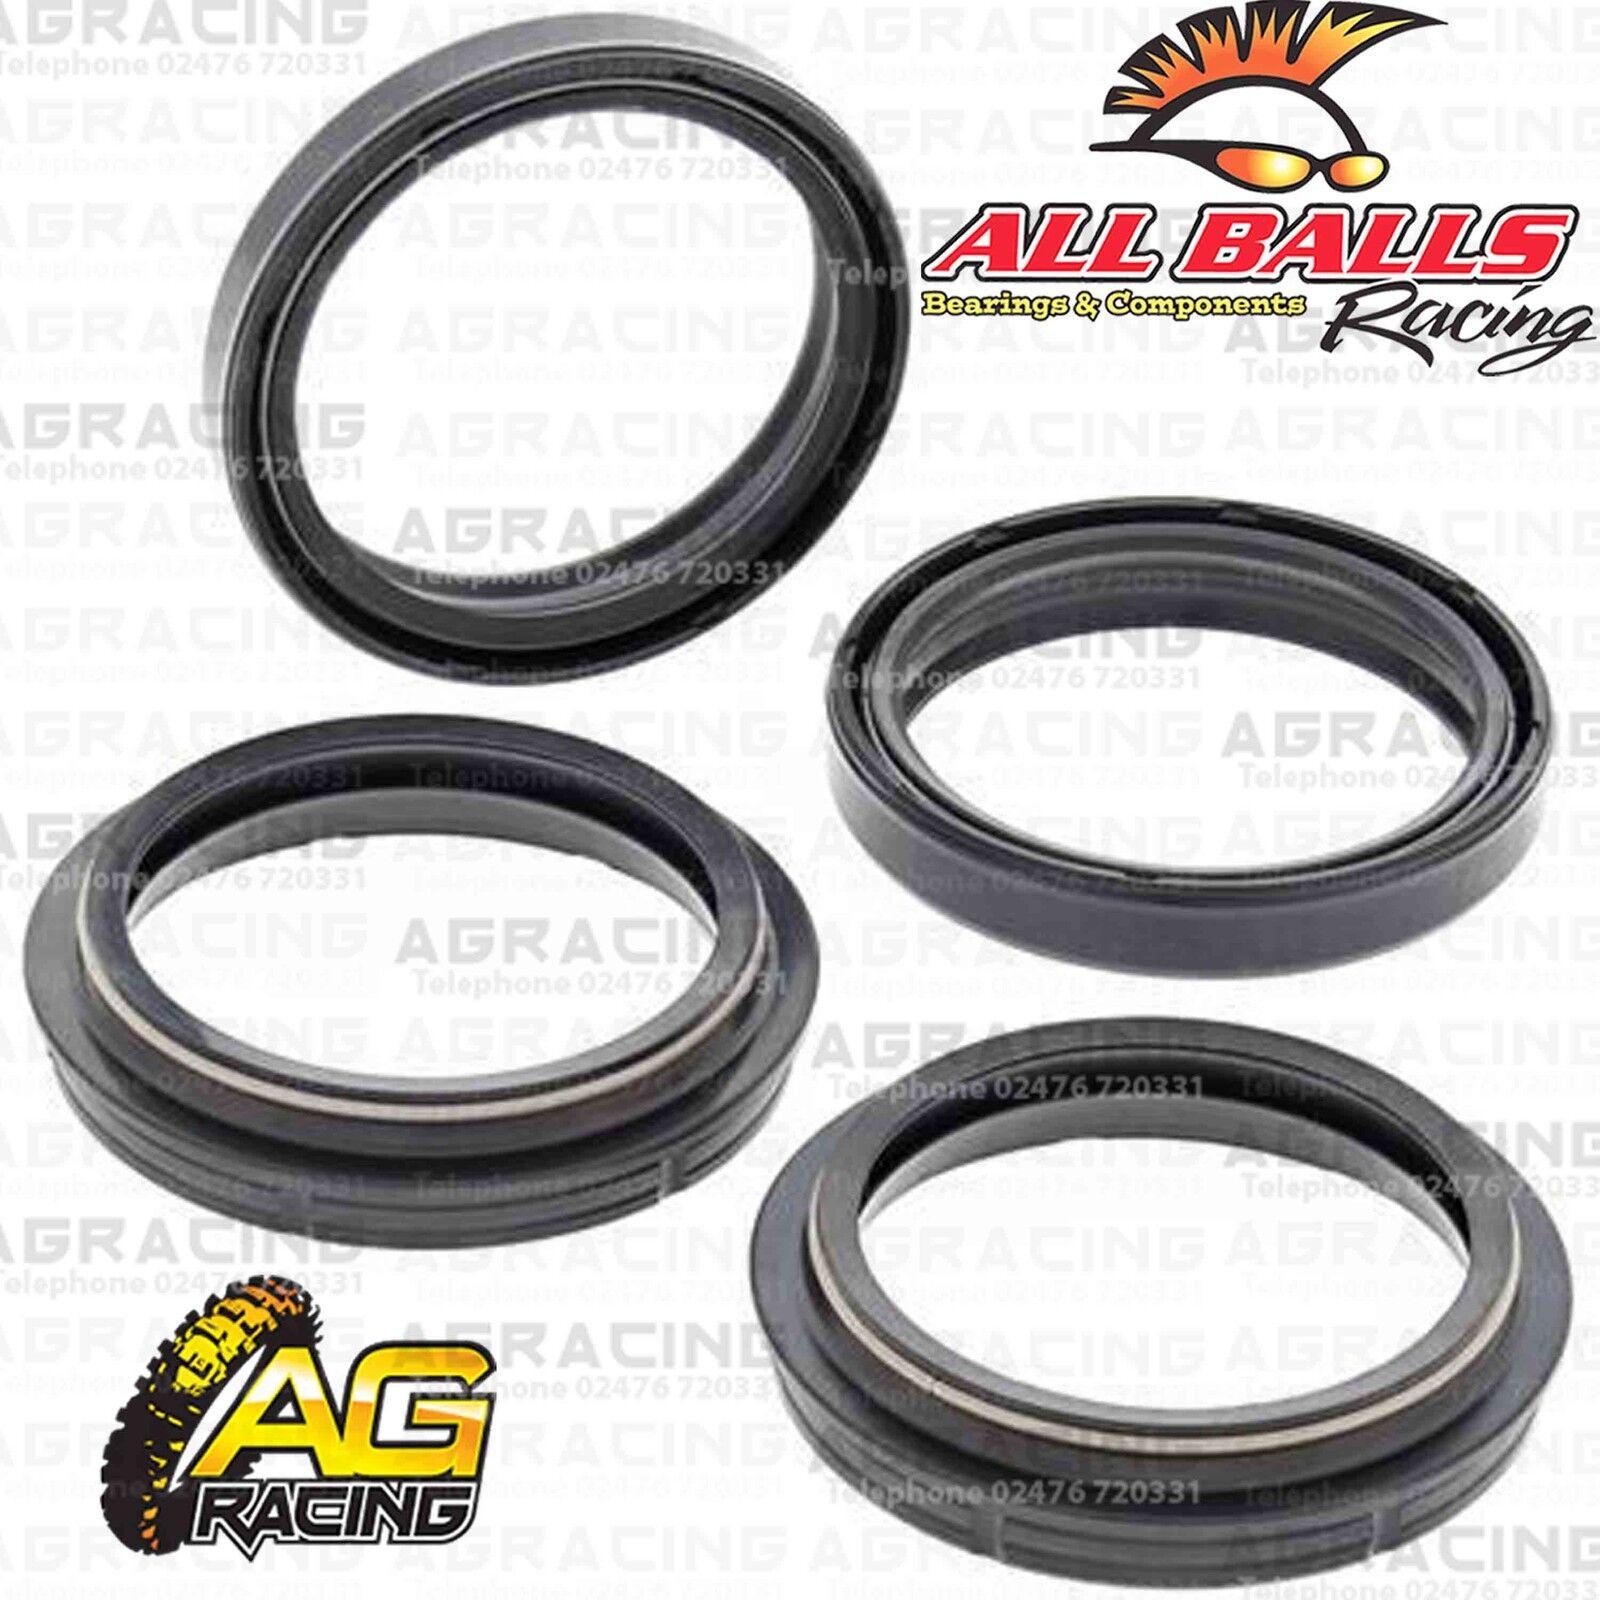 All Balls Fork Oil Seals Kit For Kawasaki KXF 450 2013 13 Motocross Enduro New